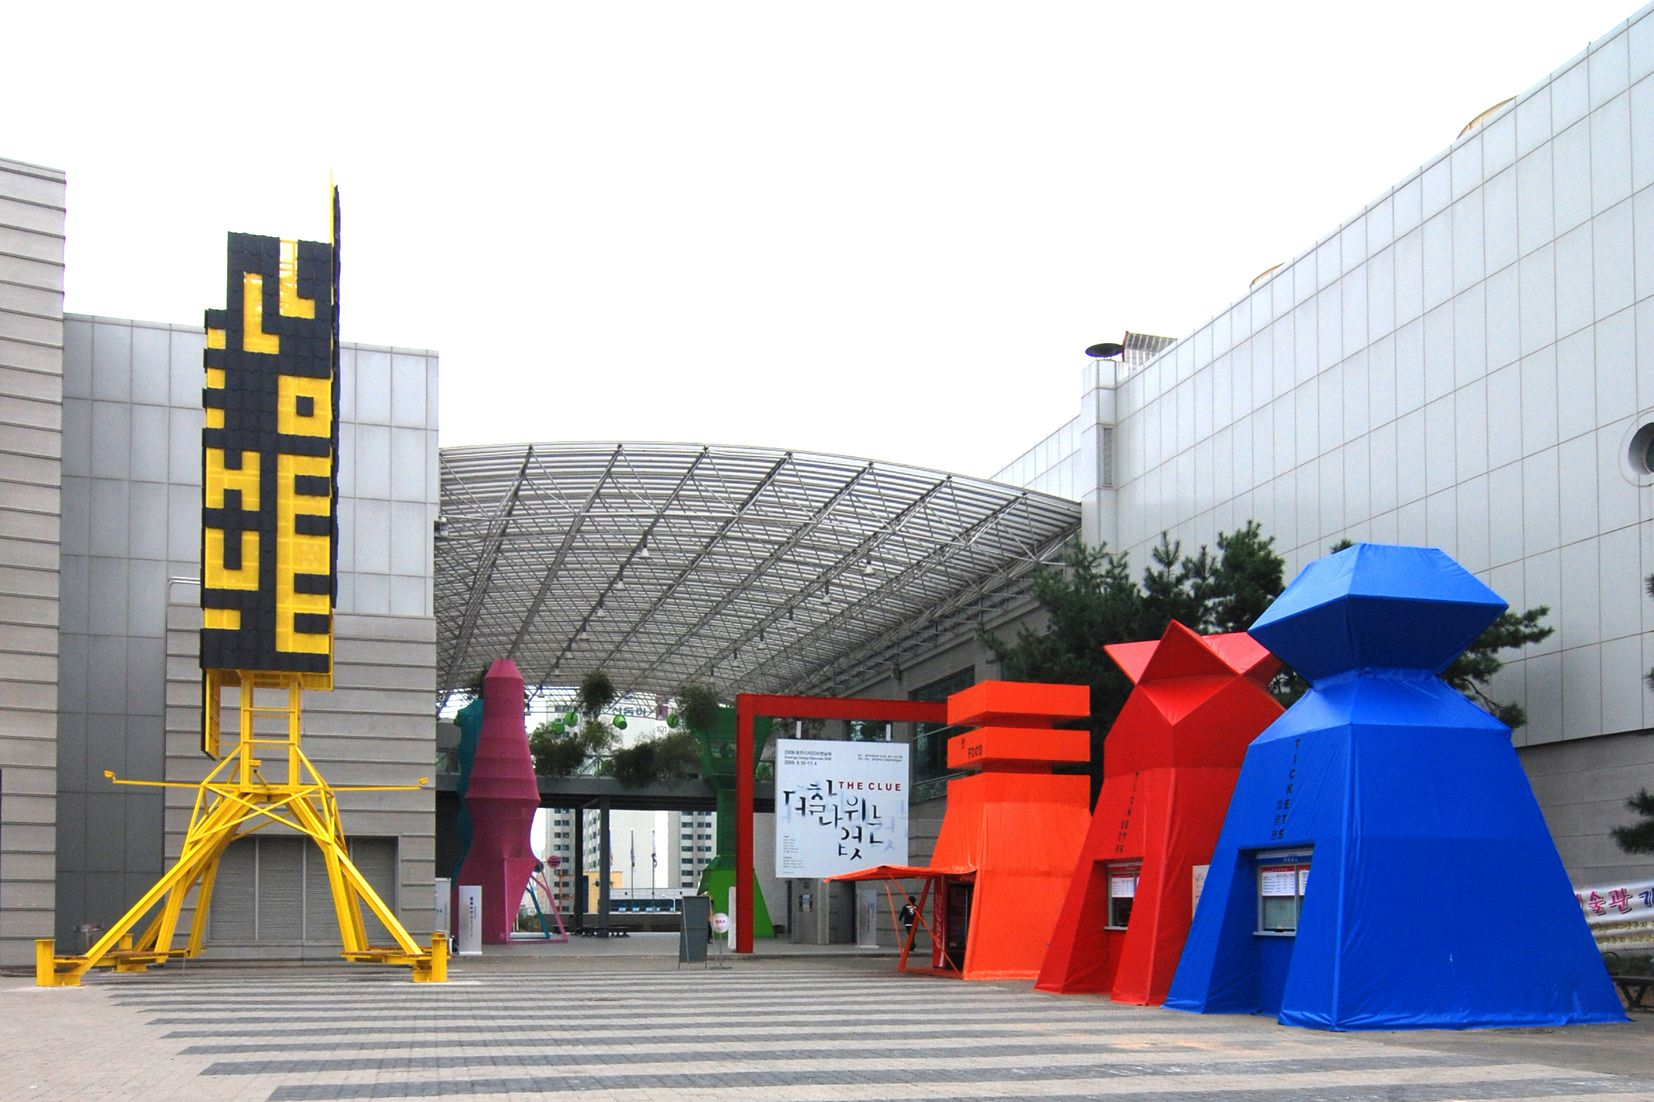 97 biennale plaza.jpg